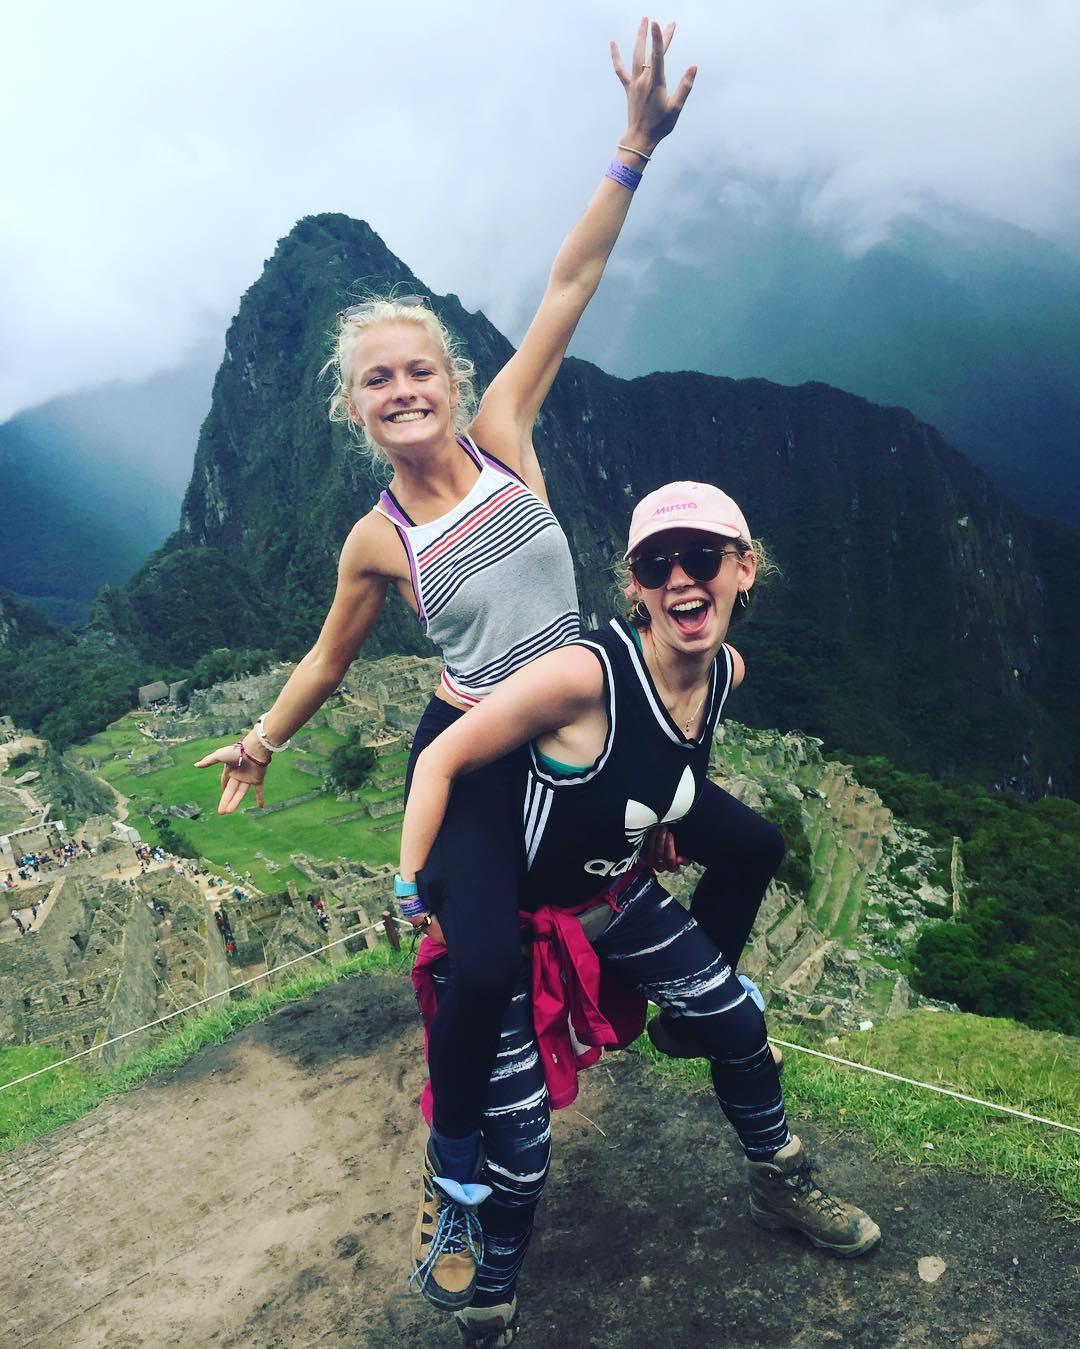 Trekking to Machu Picchu on a gap year